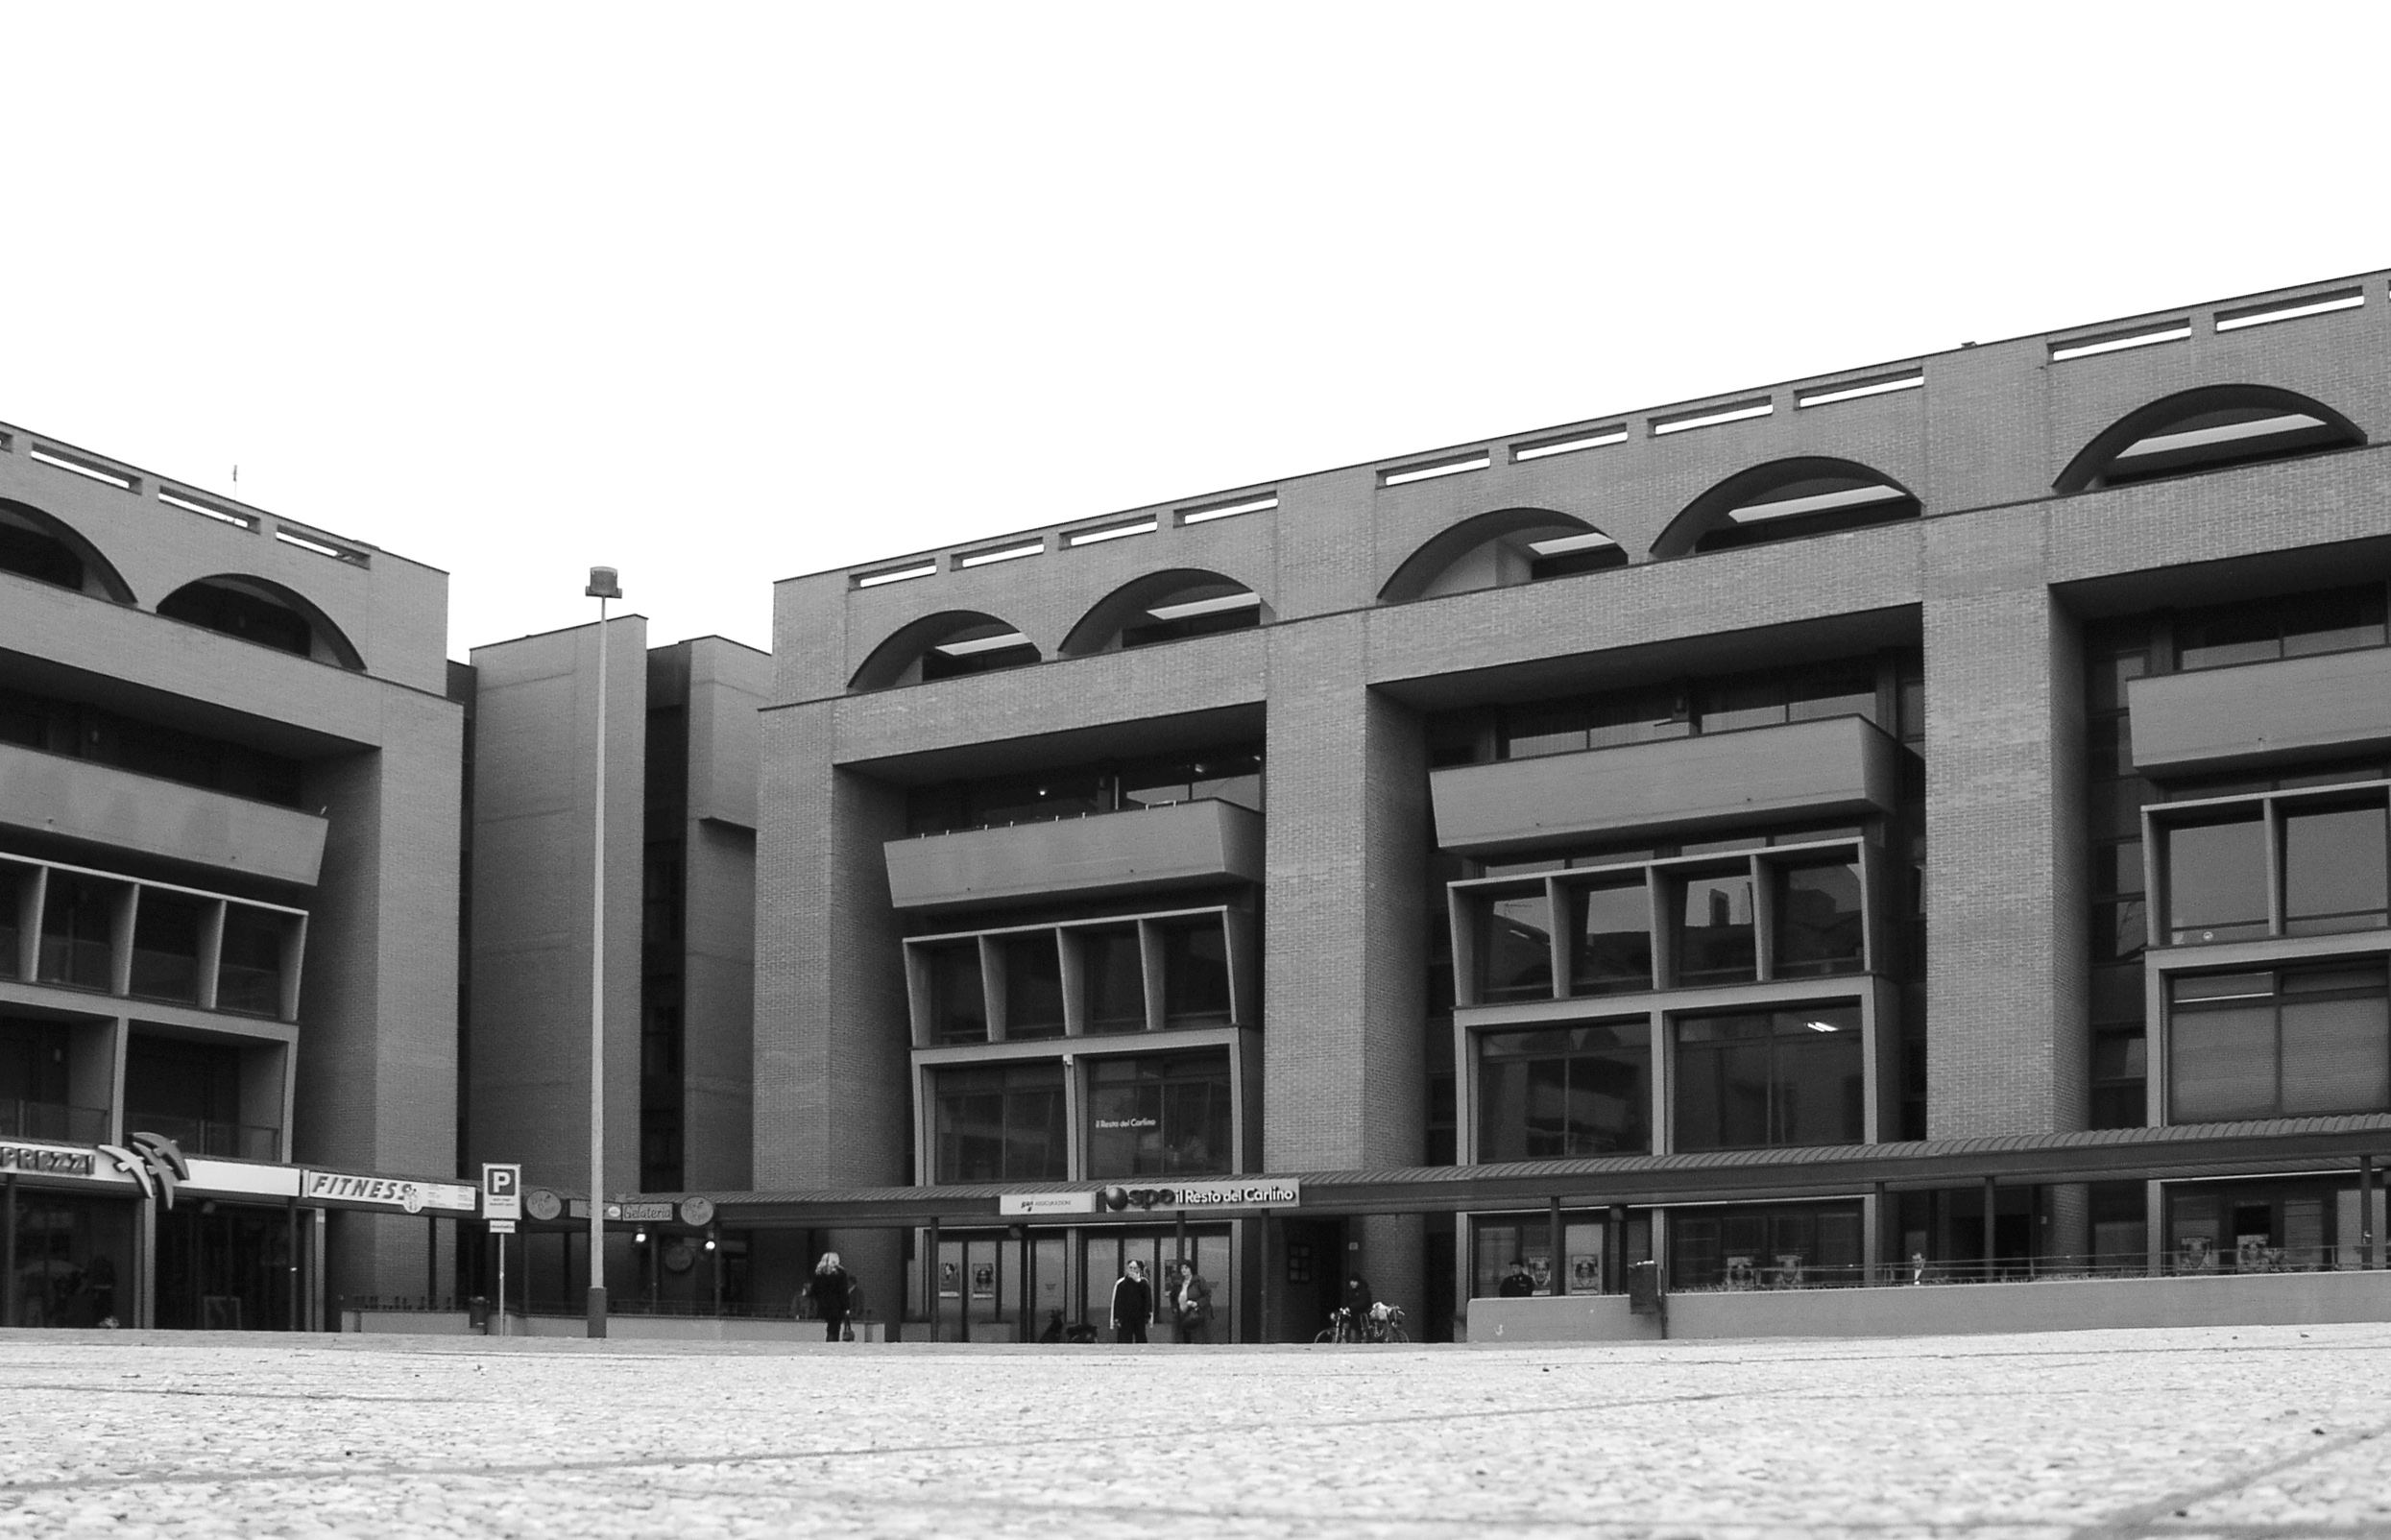 1010347 Studio Bacchi Architetti Stadium